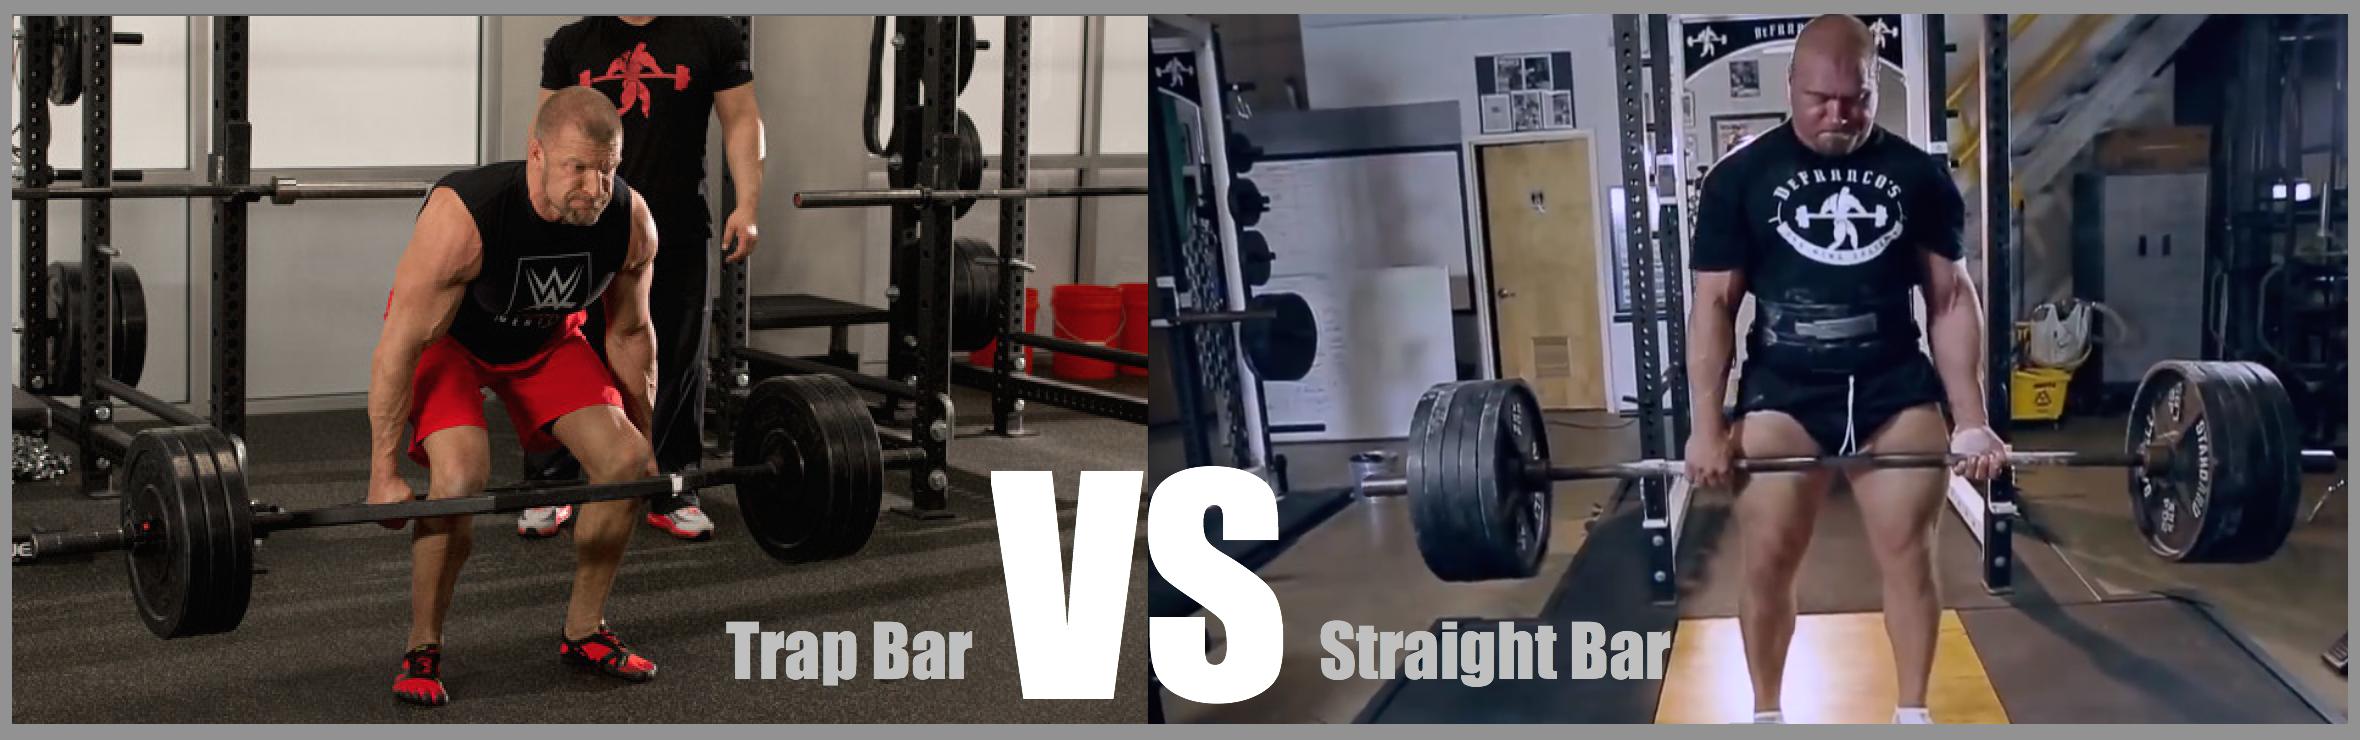 trap-bar-vs-straight-bar